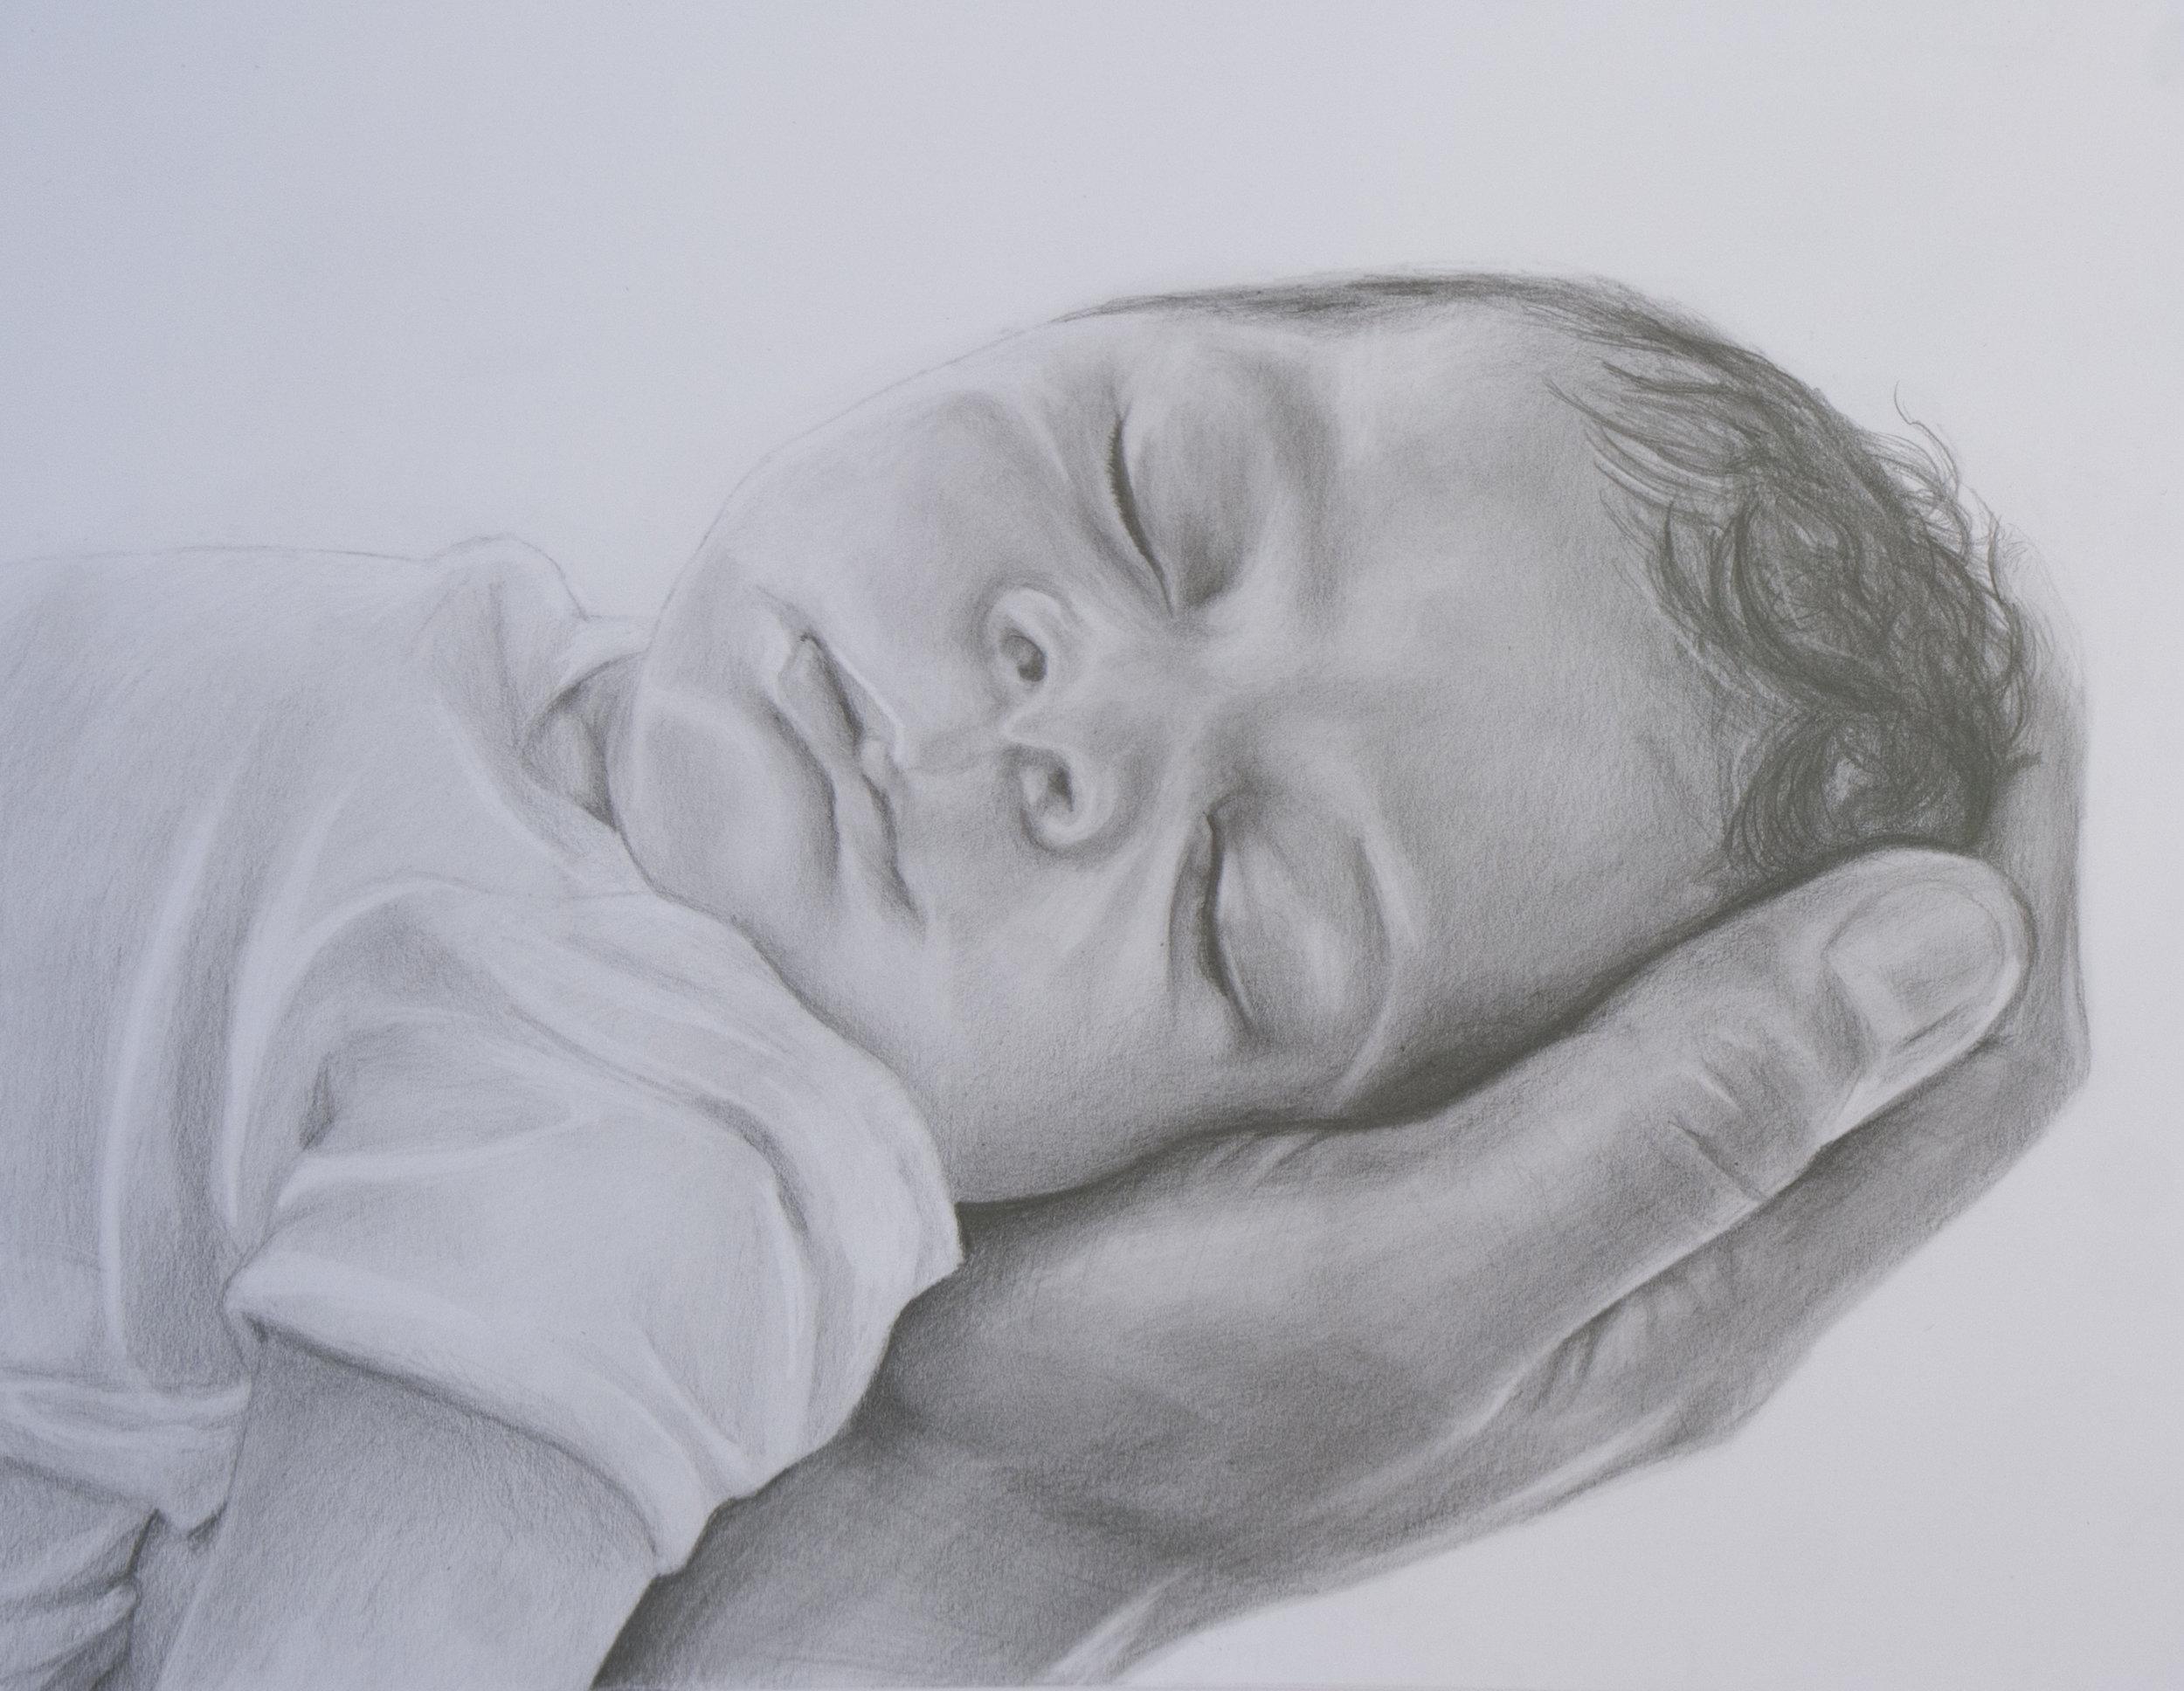 Baby_in_hand.jpg